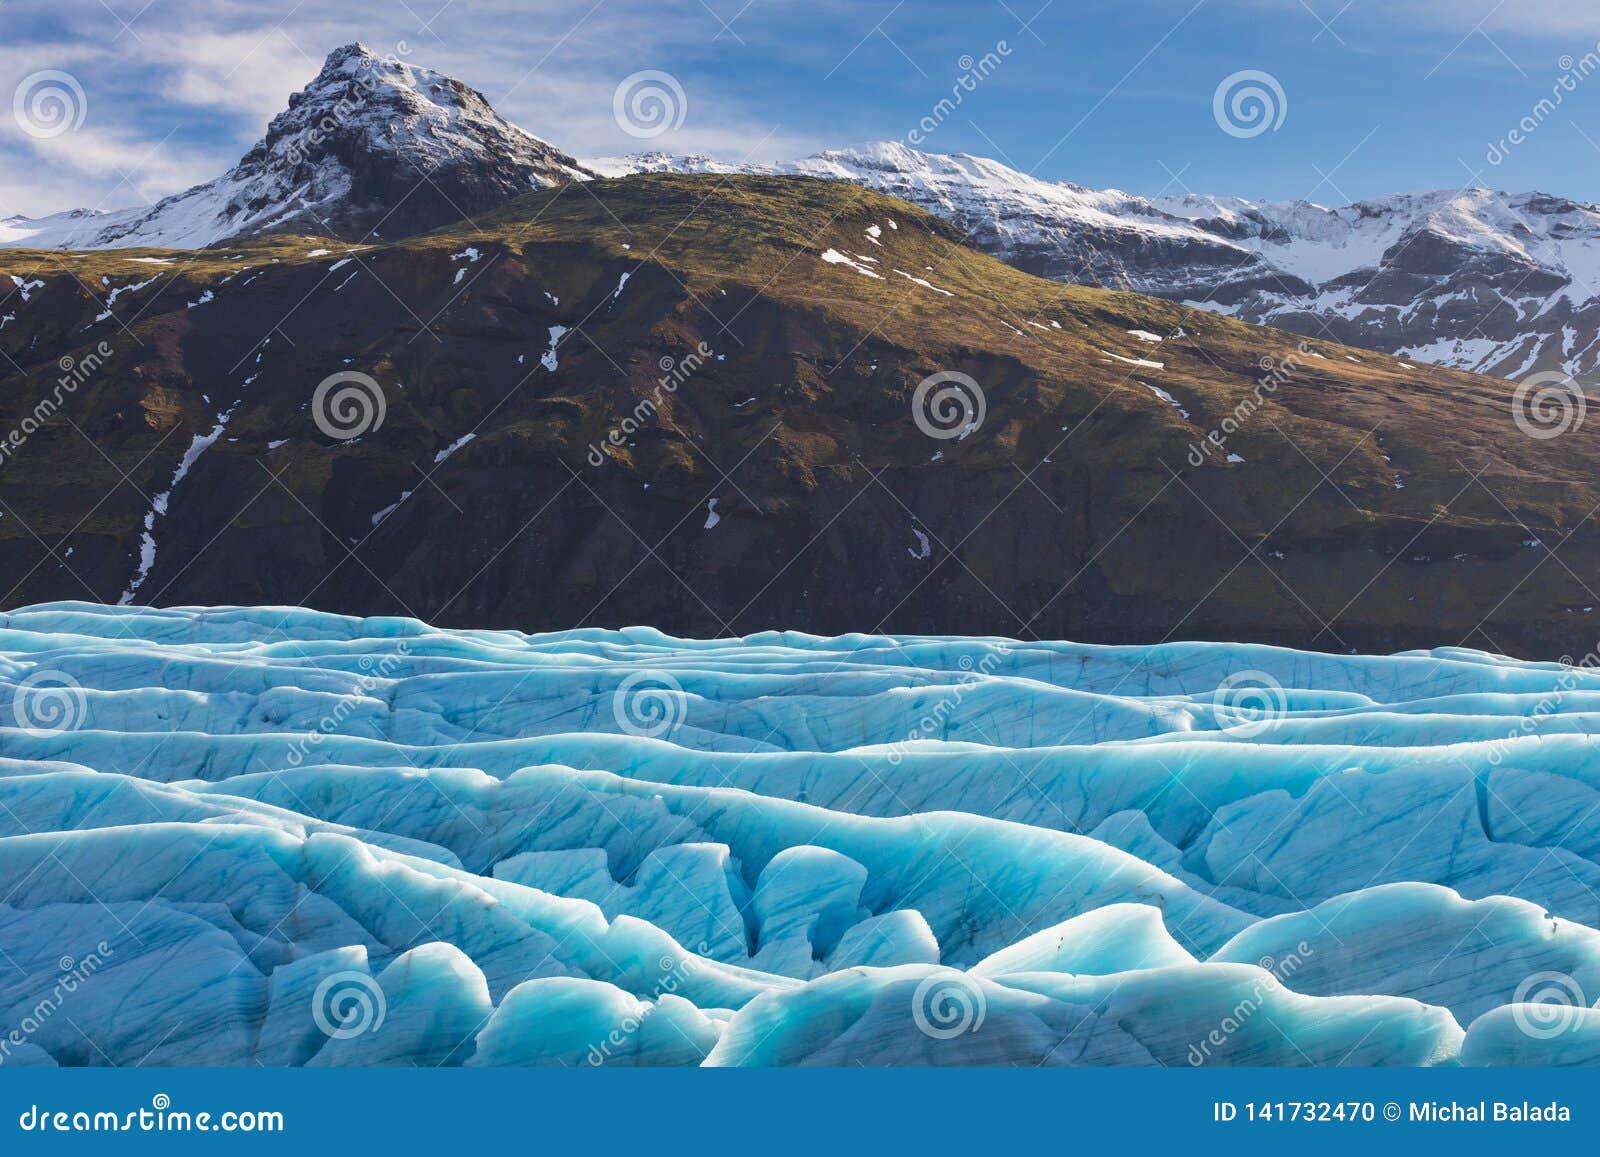 Glaciar de Skaftafell, parque nacional de Vatnajokull en Islandia